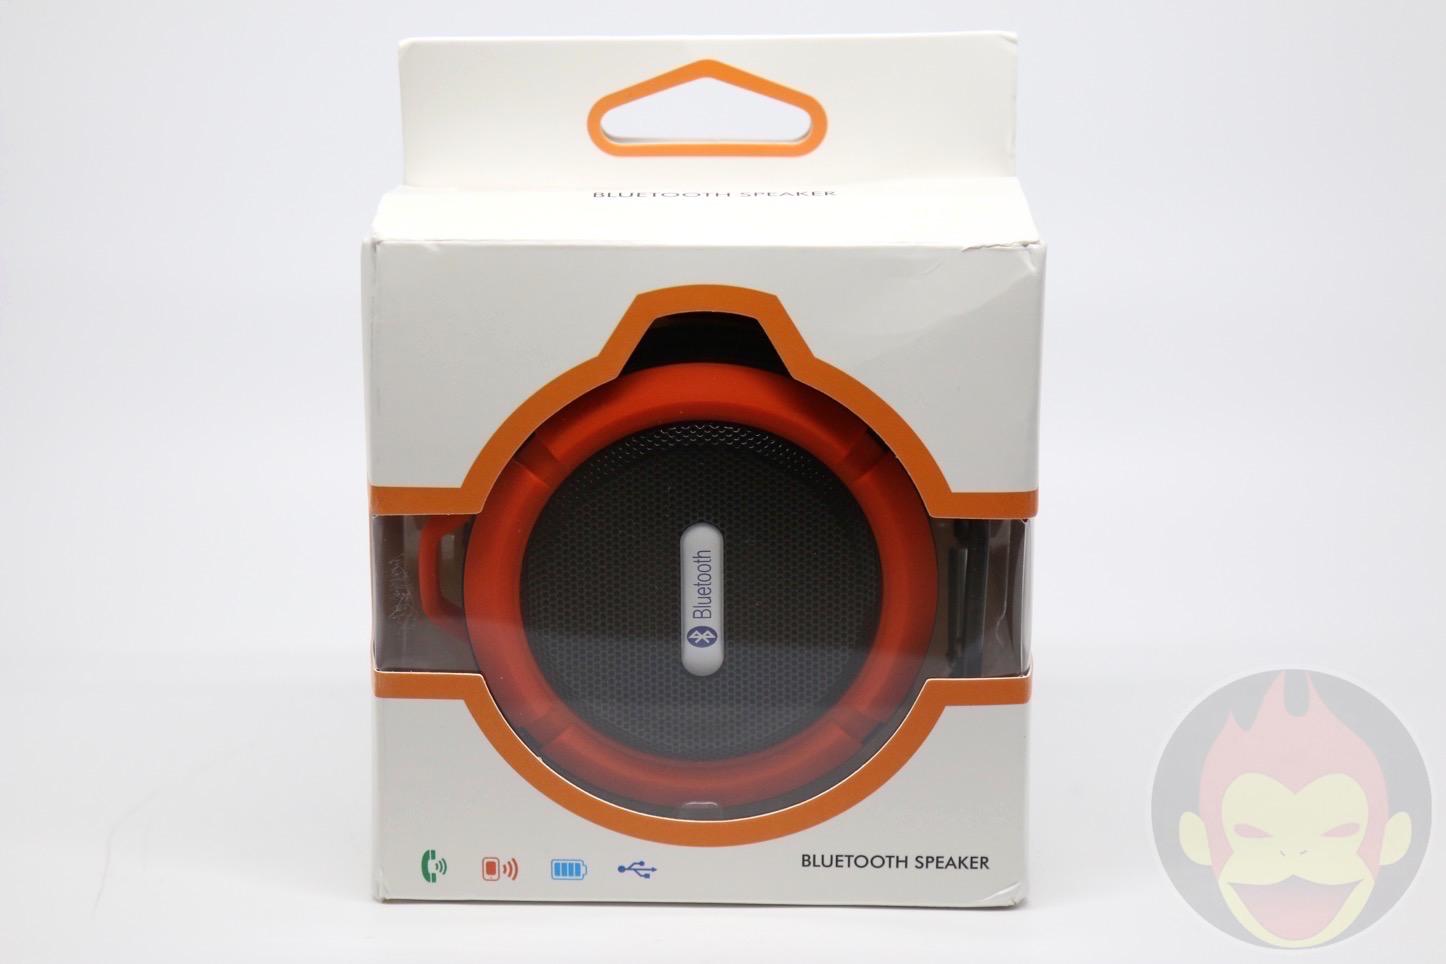 VicTsing-Bluetooth3-Speaker-01.JPG